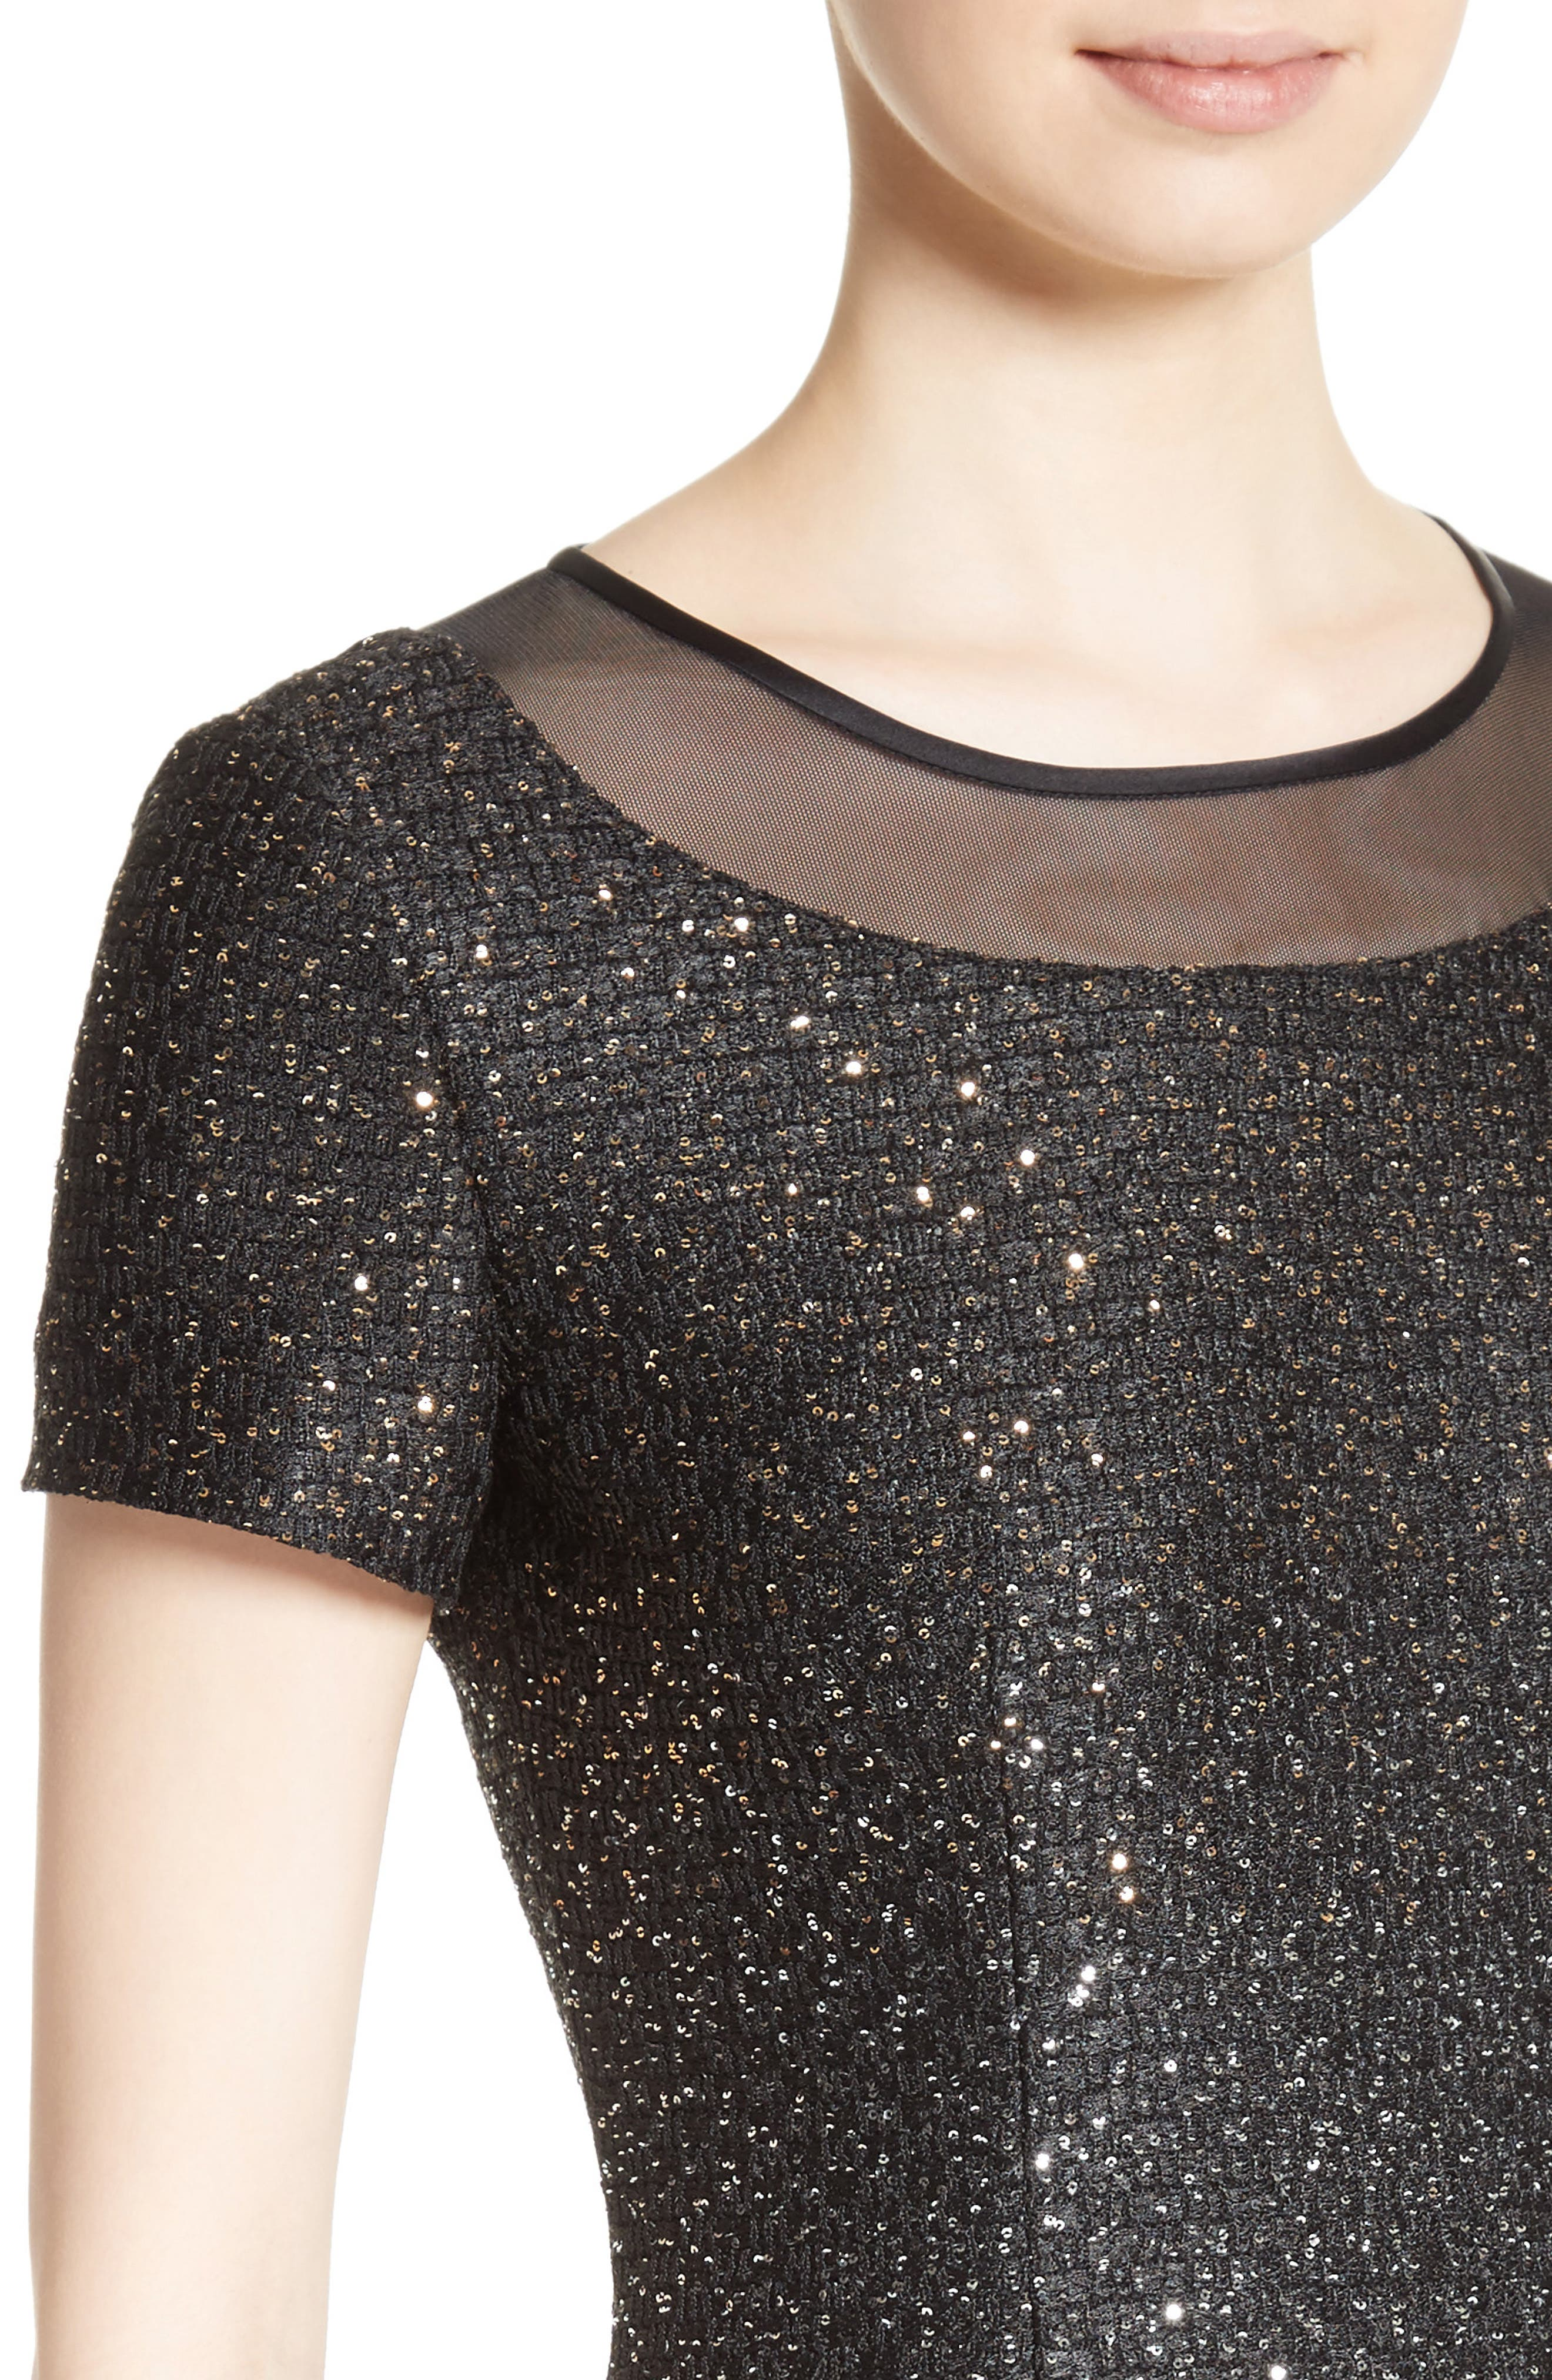 Pranay Sequin Knit Sheath Dress,                             Alternate thumbnail 4, color,                             001